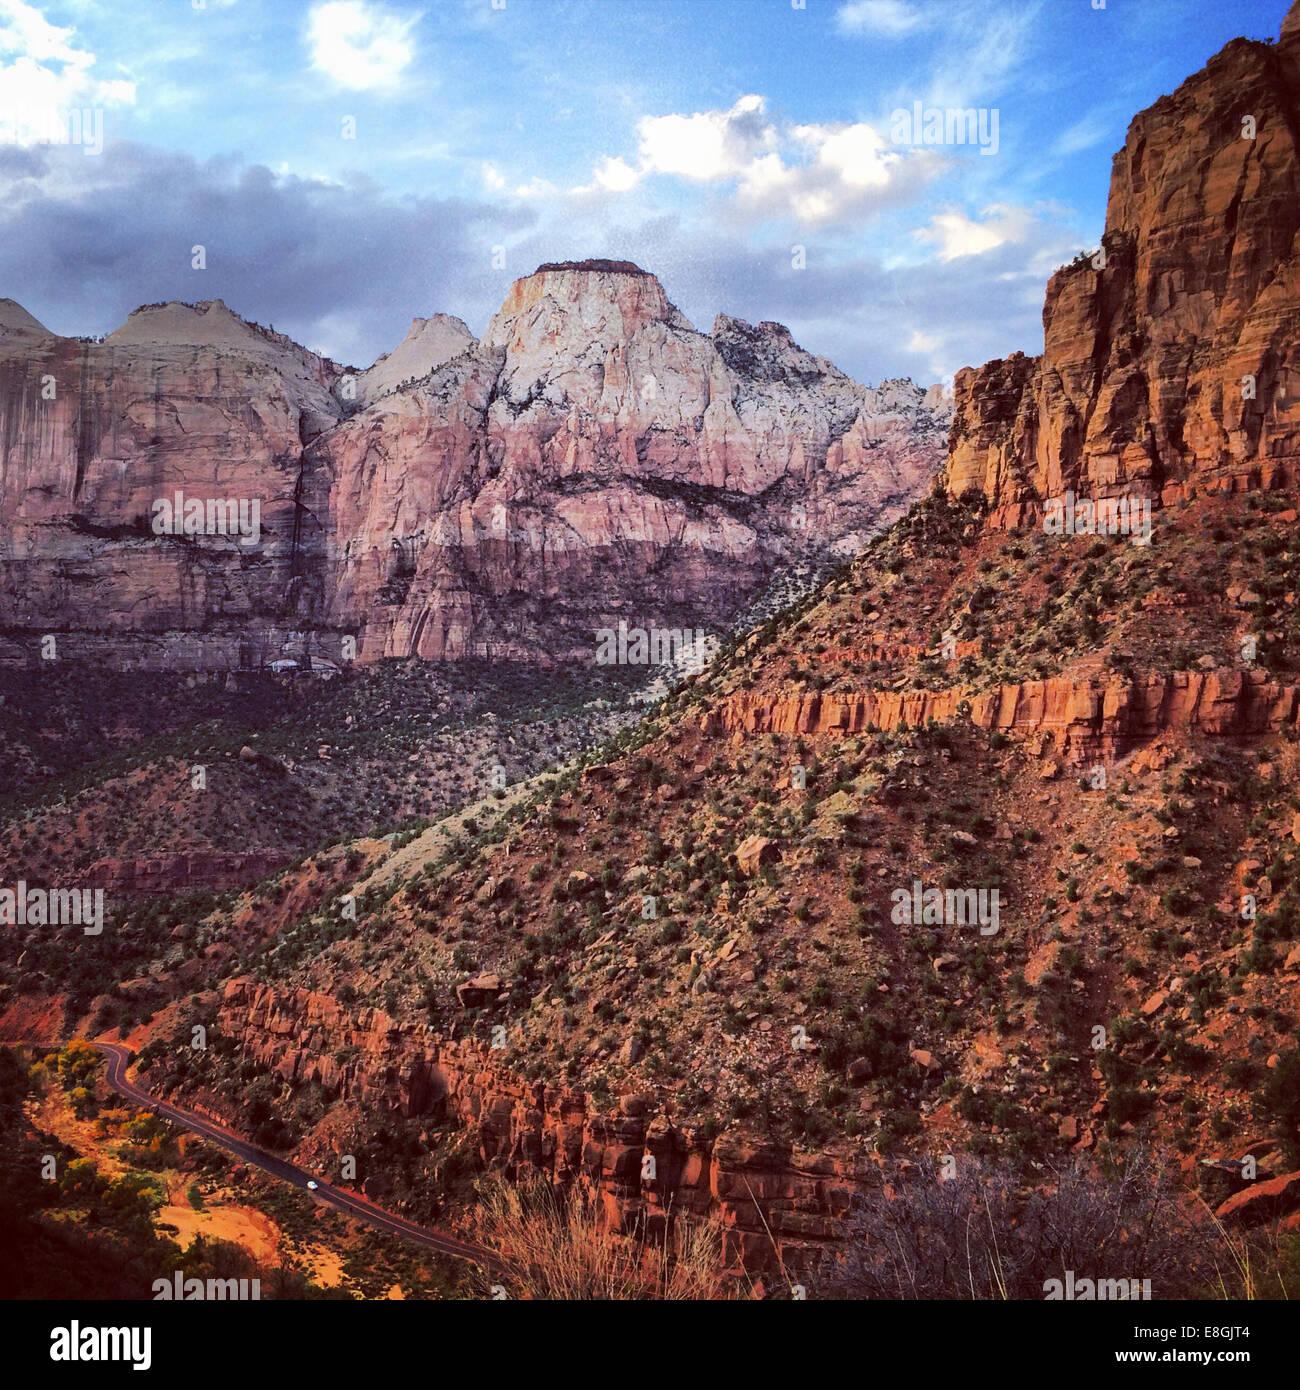 Zion Nationalpark, Utah, Amerika, USA Stockbild